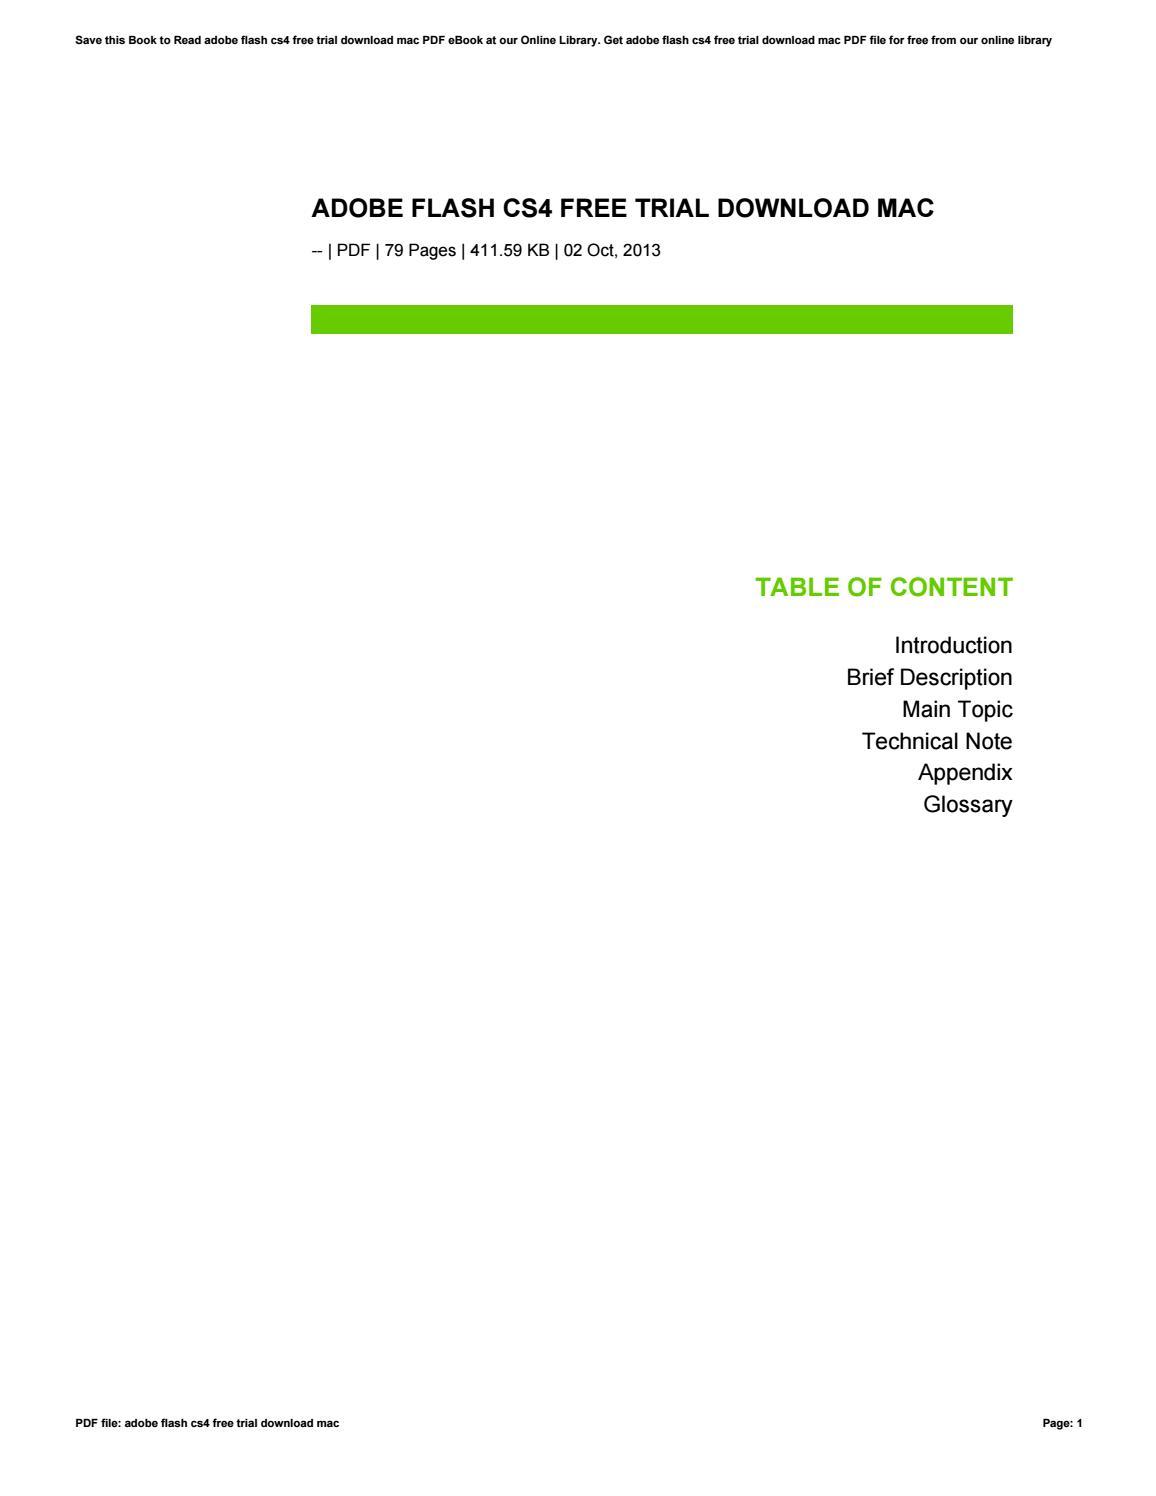 Adobe flash cs4 free trial download mac.